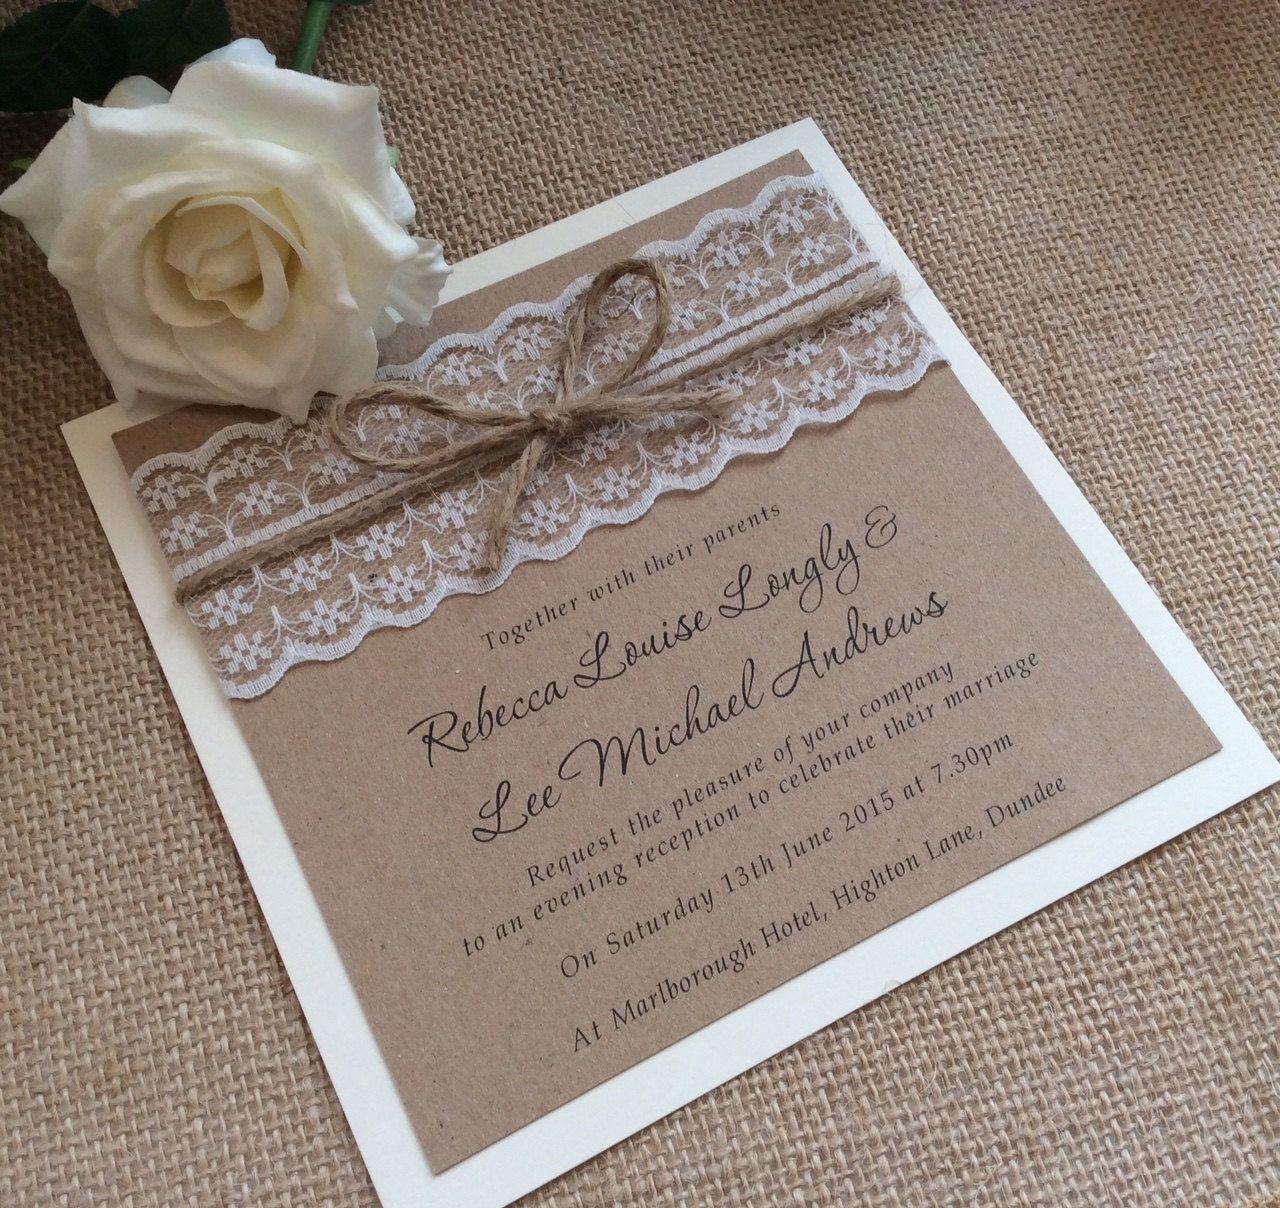 wedding invitation diy kits uk%0A Physical Map Of Czech Republic